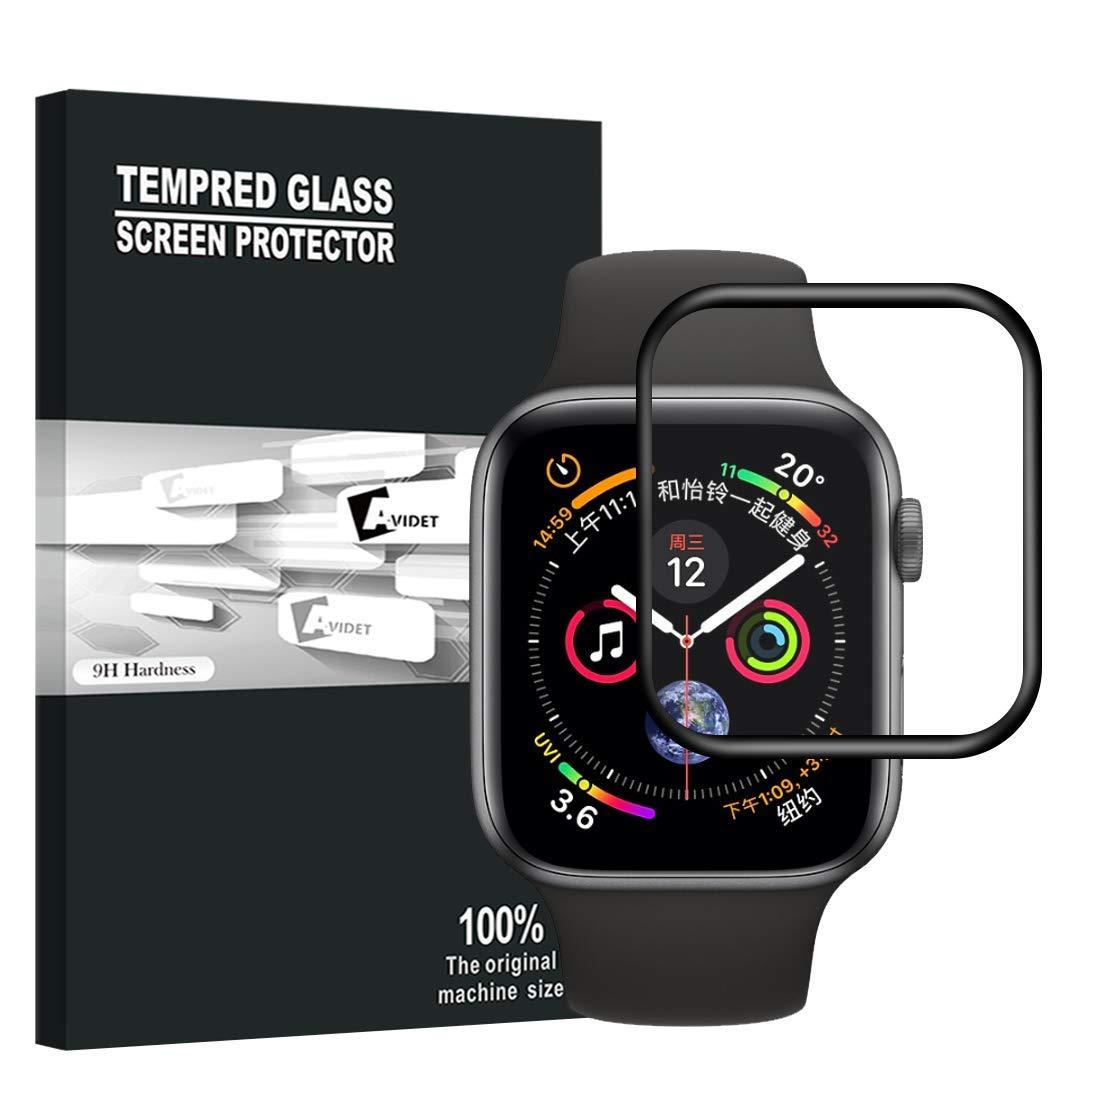 AVIDET Screen Protector for Apple Watch Series 4 40mm, 9H Hardness 0.3mm Ultra Slim 3D Full Coverage Premium Tempered Glass Screen Protector for Apple Watch Series 4 40mm(Black)